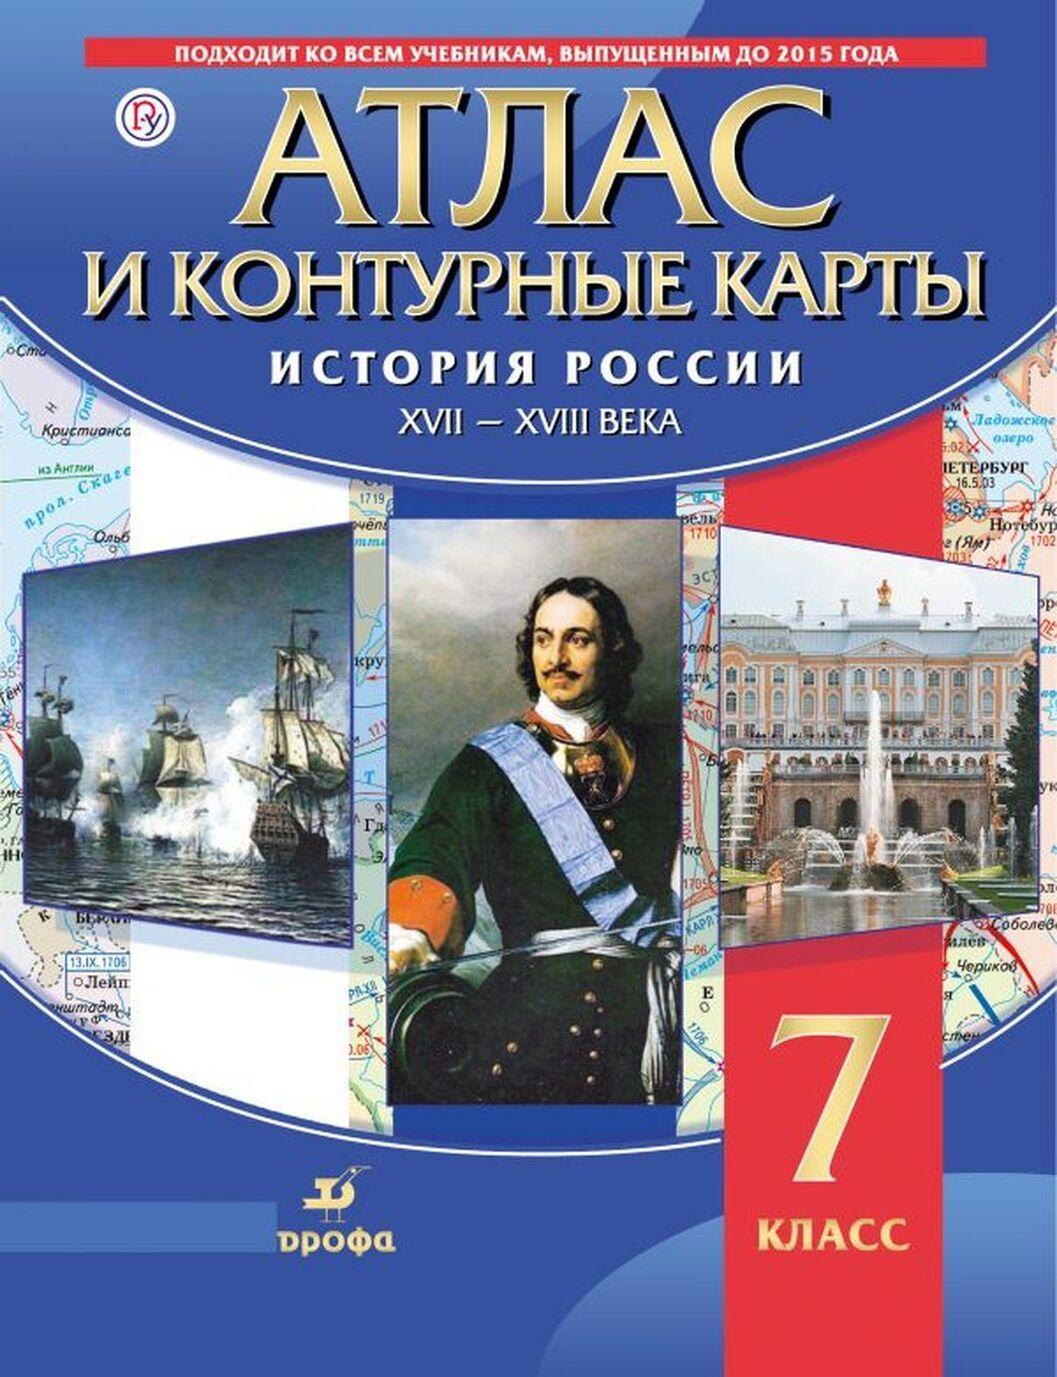 Istorija Rossii. XVII-XVIII vv. Atlas i konturnye karty